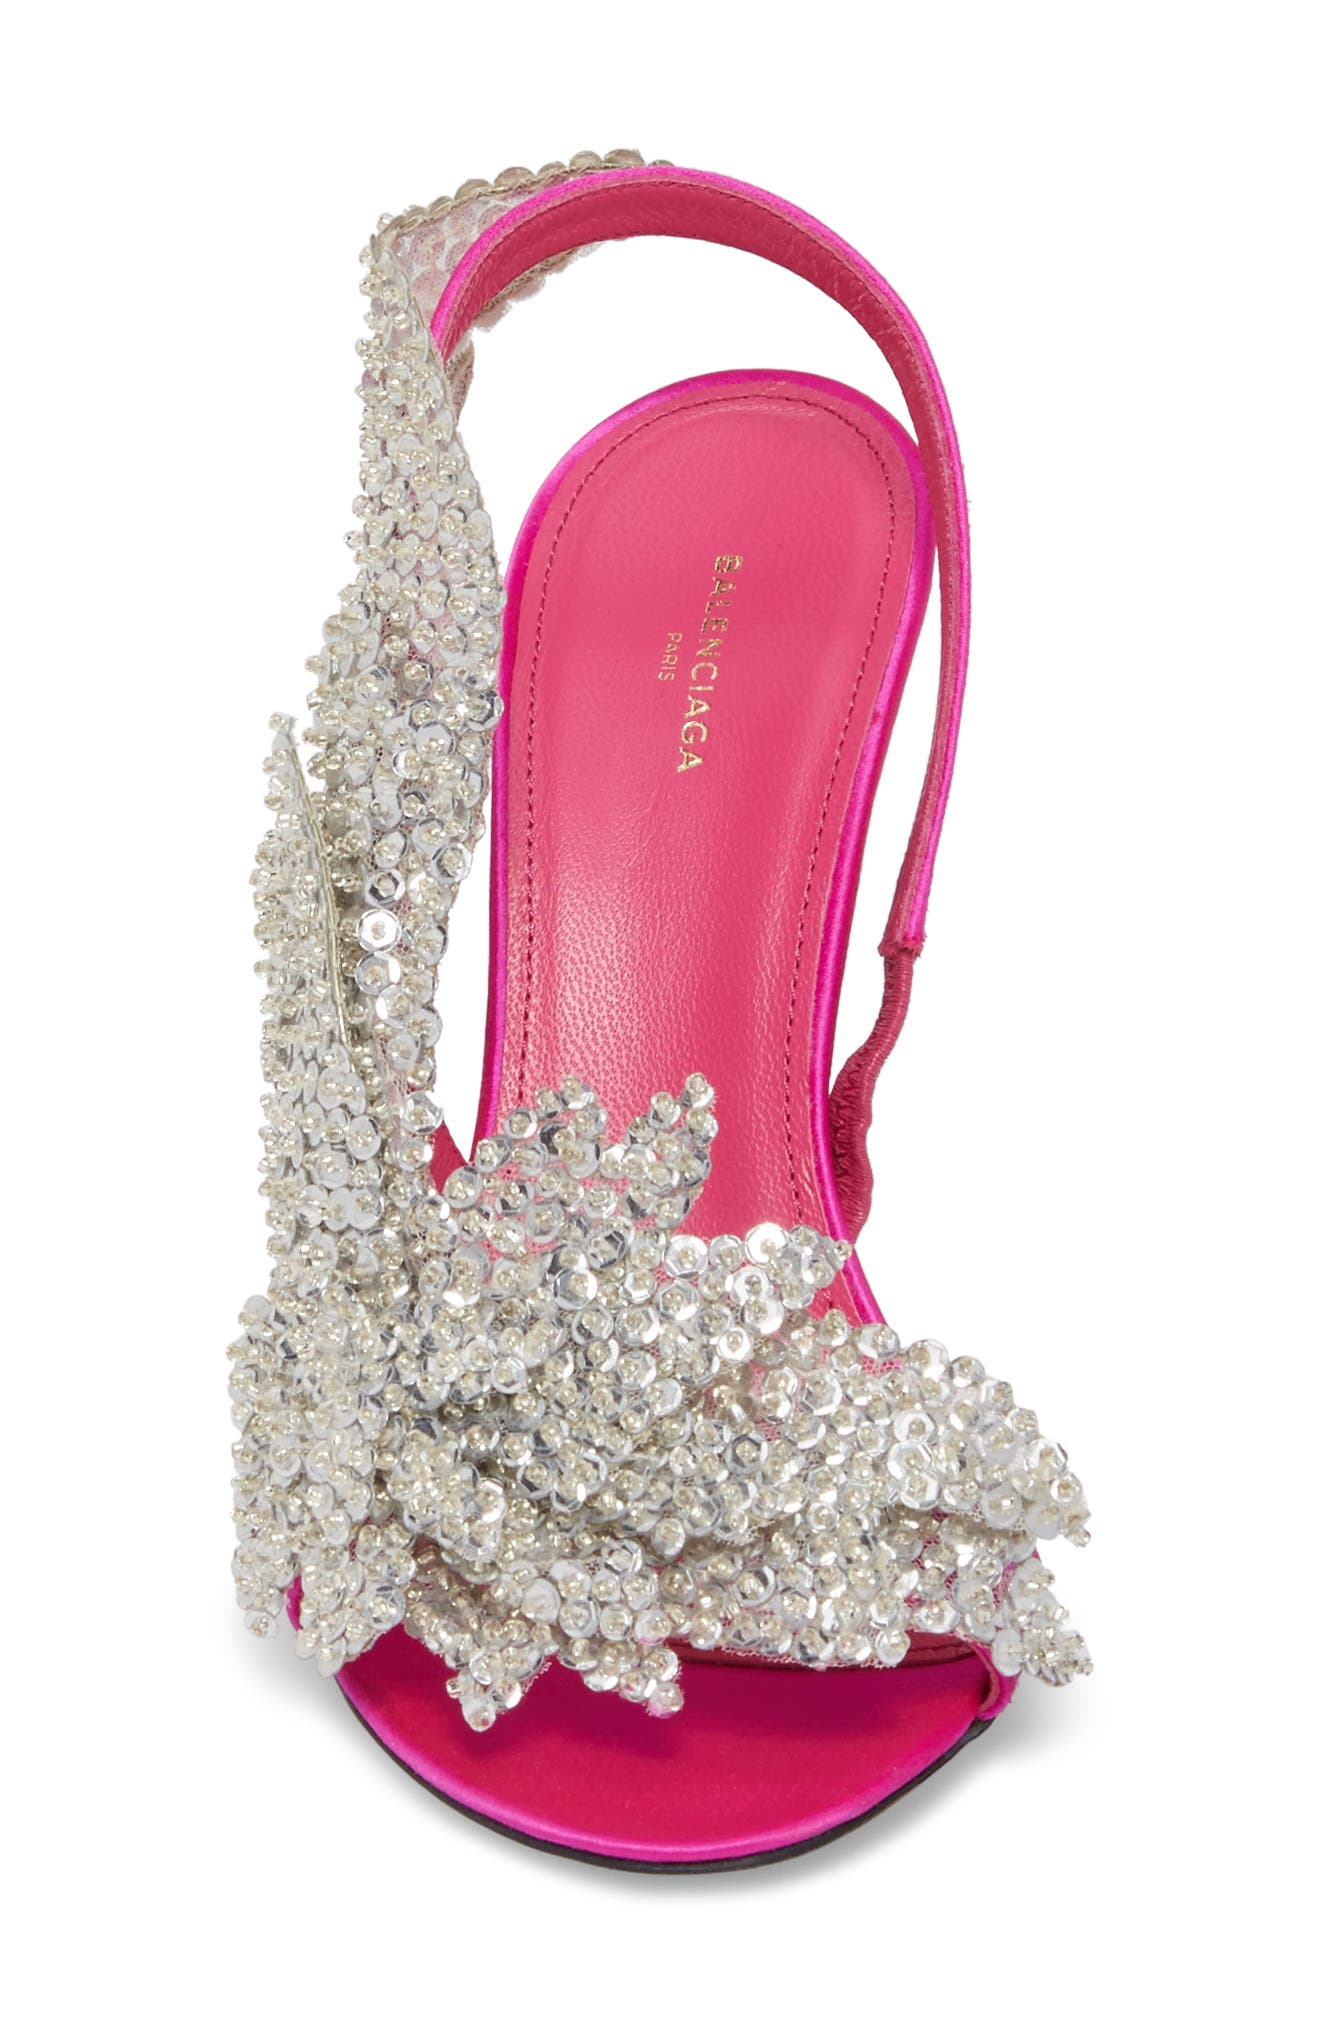 Embellished Slingback Sandal,                             Alternate thumbnail 4, color,                             Rose Fuchsia/ Crystal